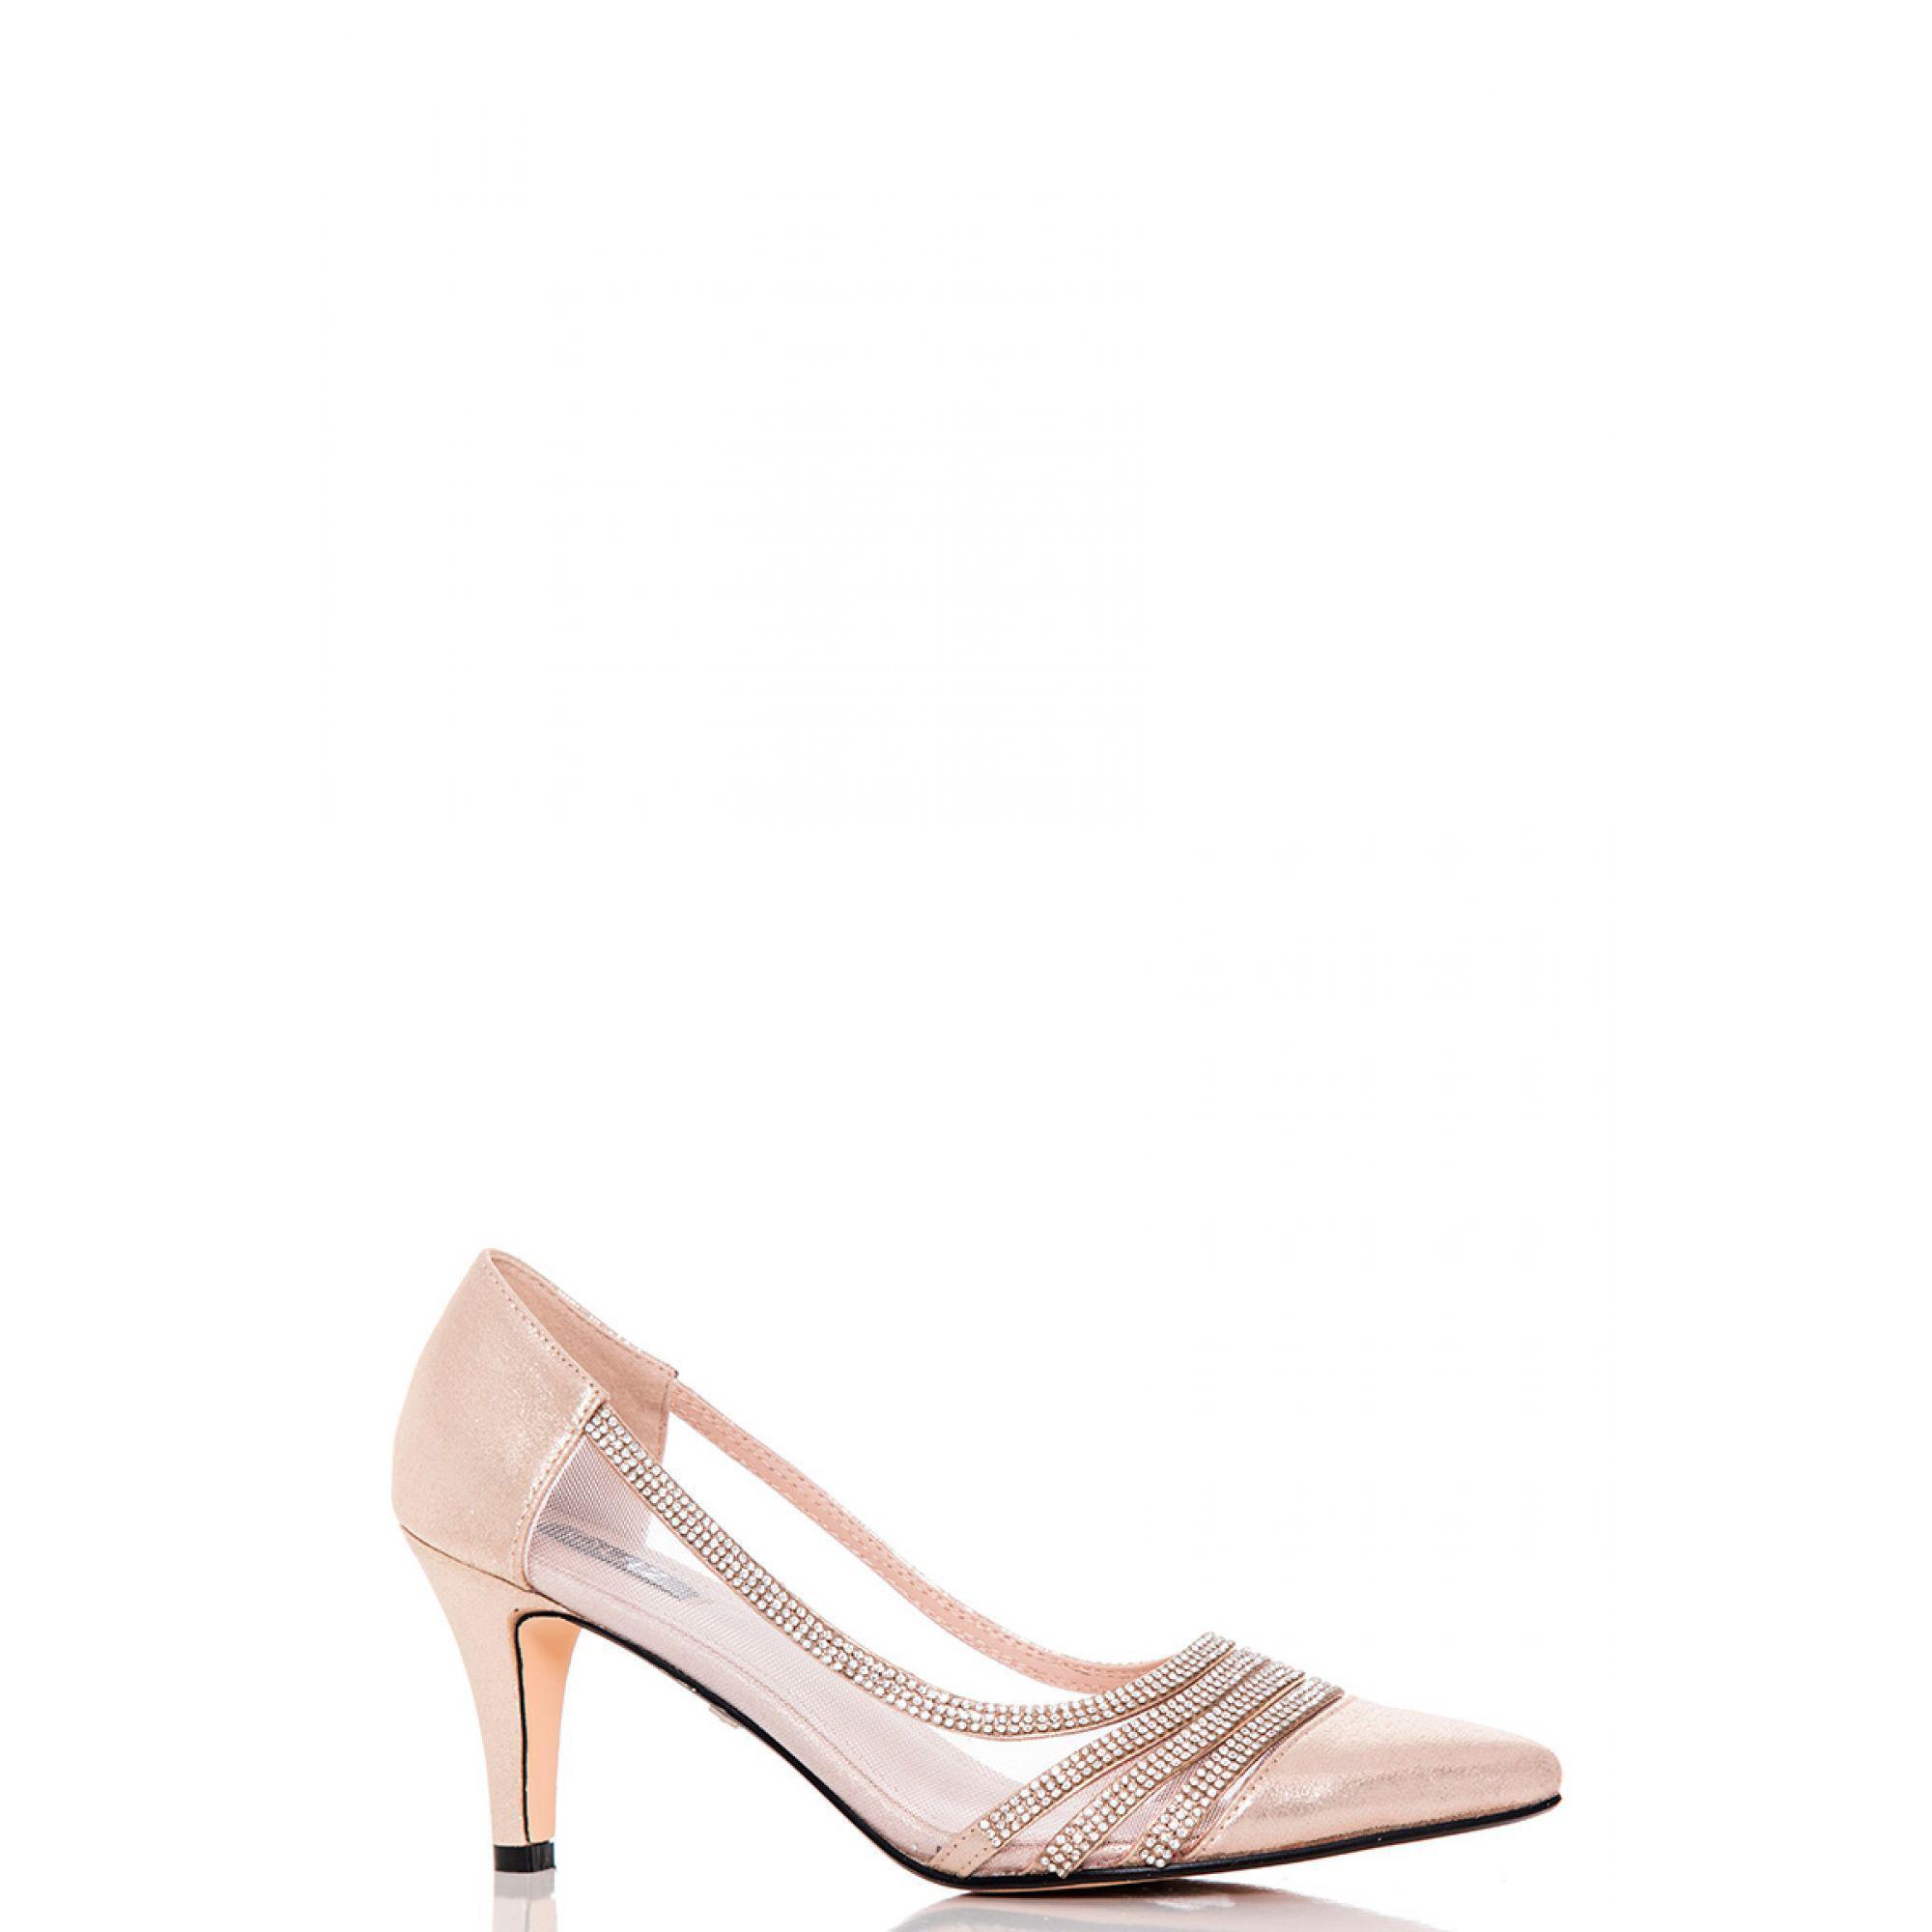 826d0c0e6f1b Quiz. Women s Metallic Gold Shimmer Diamante And Mesh Low Heel Court Shoes